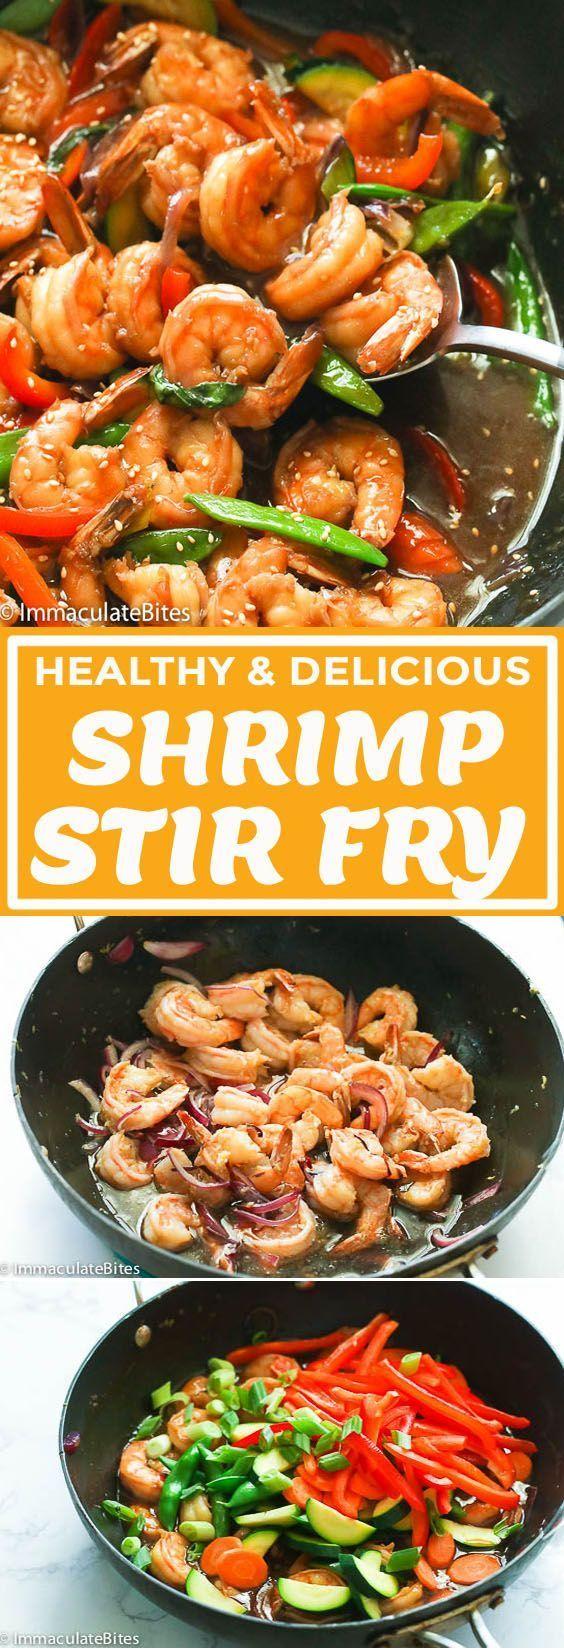 Shrimp Stir Fry #healthystirfry Shrimp Stir Fry #easy #healthy #recipes #sauce #shrimps #dinner #lowcarb #seafood #stirfryshrimp Shrimp Stir Fry #healthystirfry Shrimp Stir Fry #easy #healthy #recipes #sauce #shrimps #dinner #lowcarb #seafood #stirfryshrimp